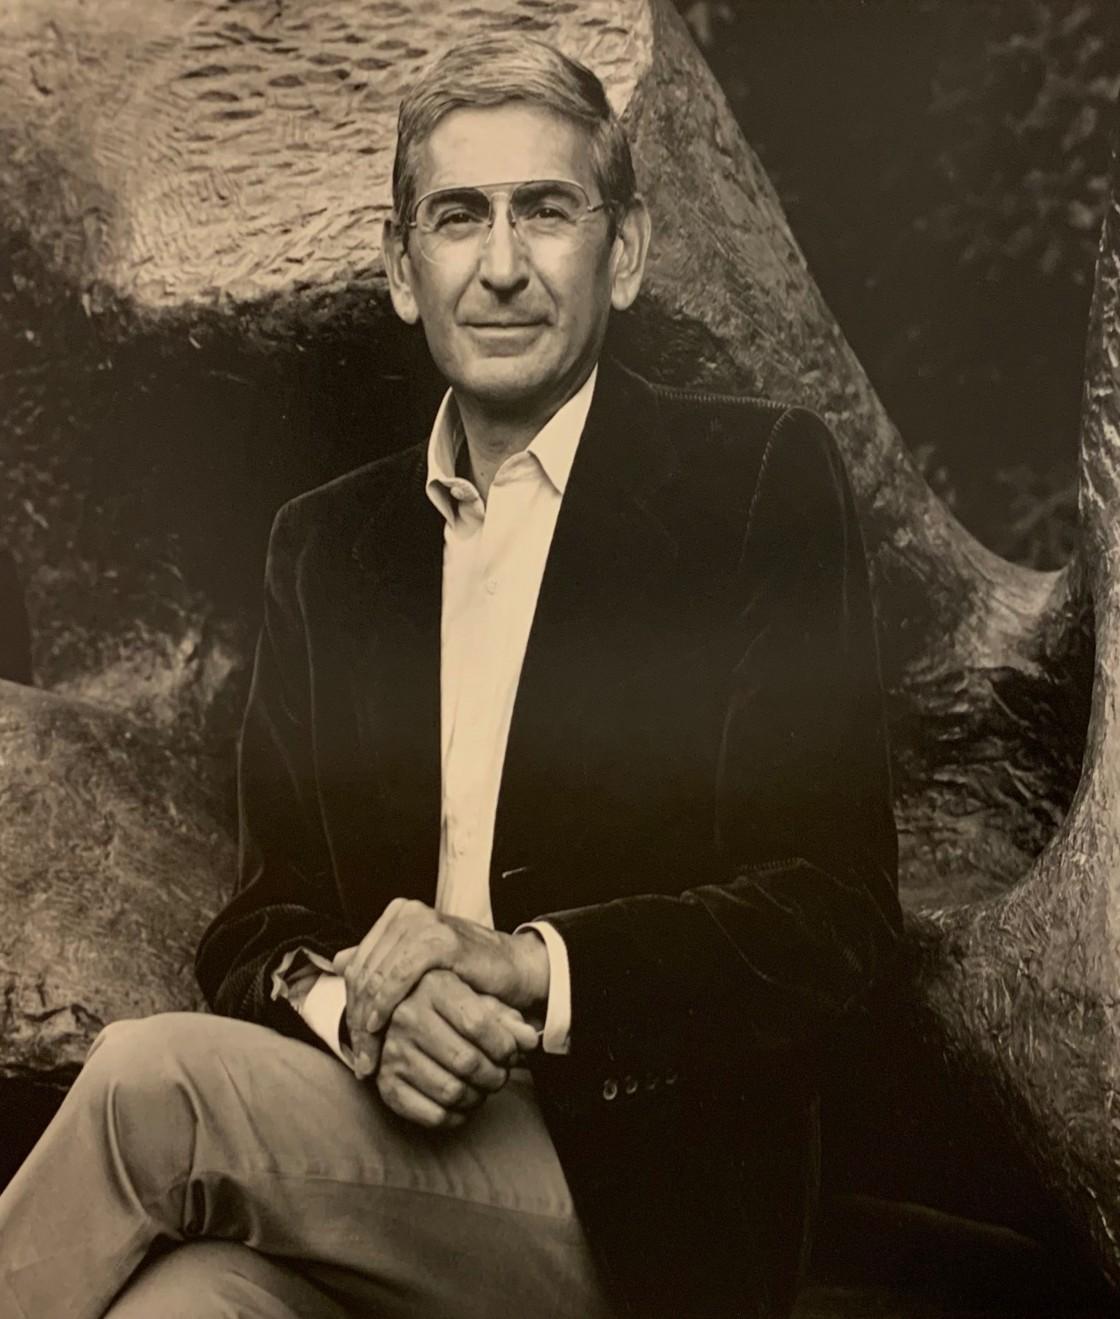 Portrait of Eli Broad by Luca Vignelli